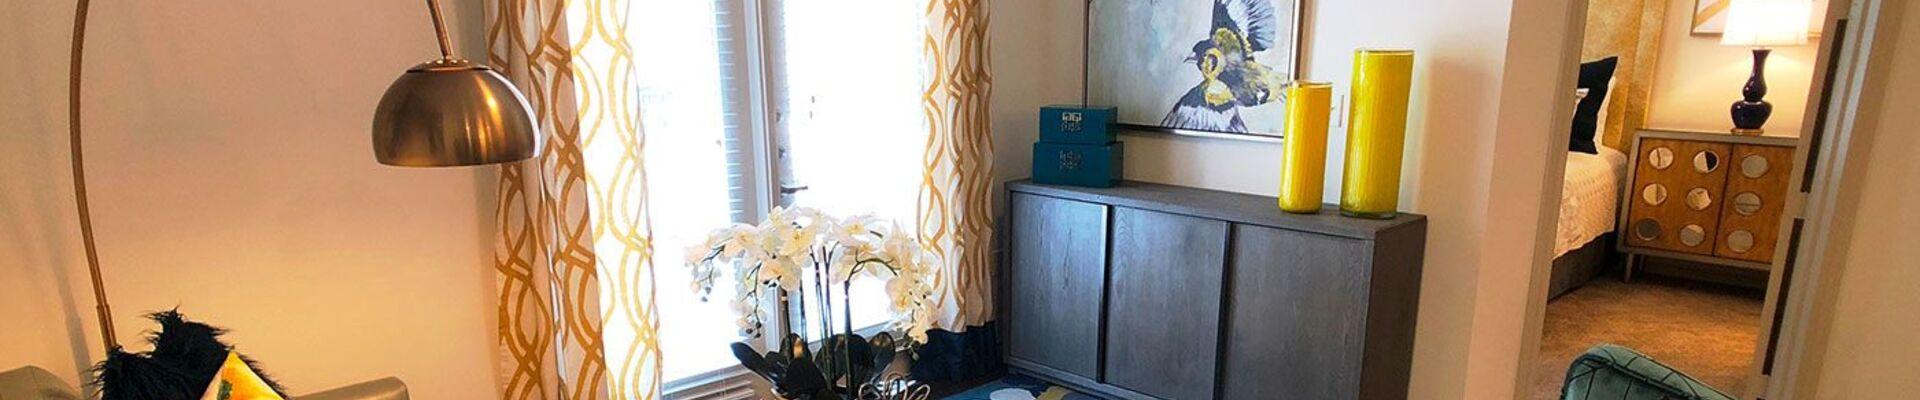 Apartments For Rent Rowlett Tx Terra Lago